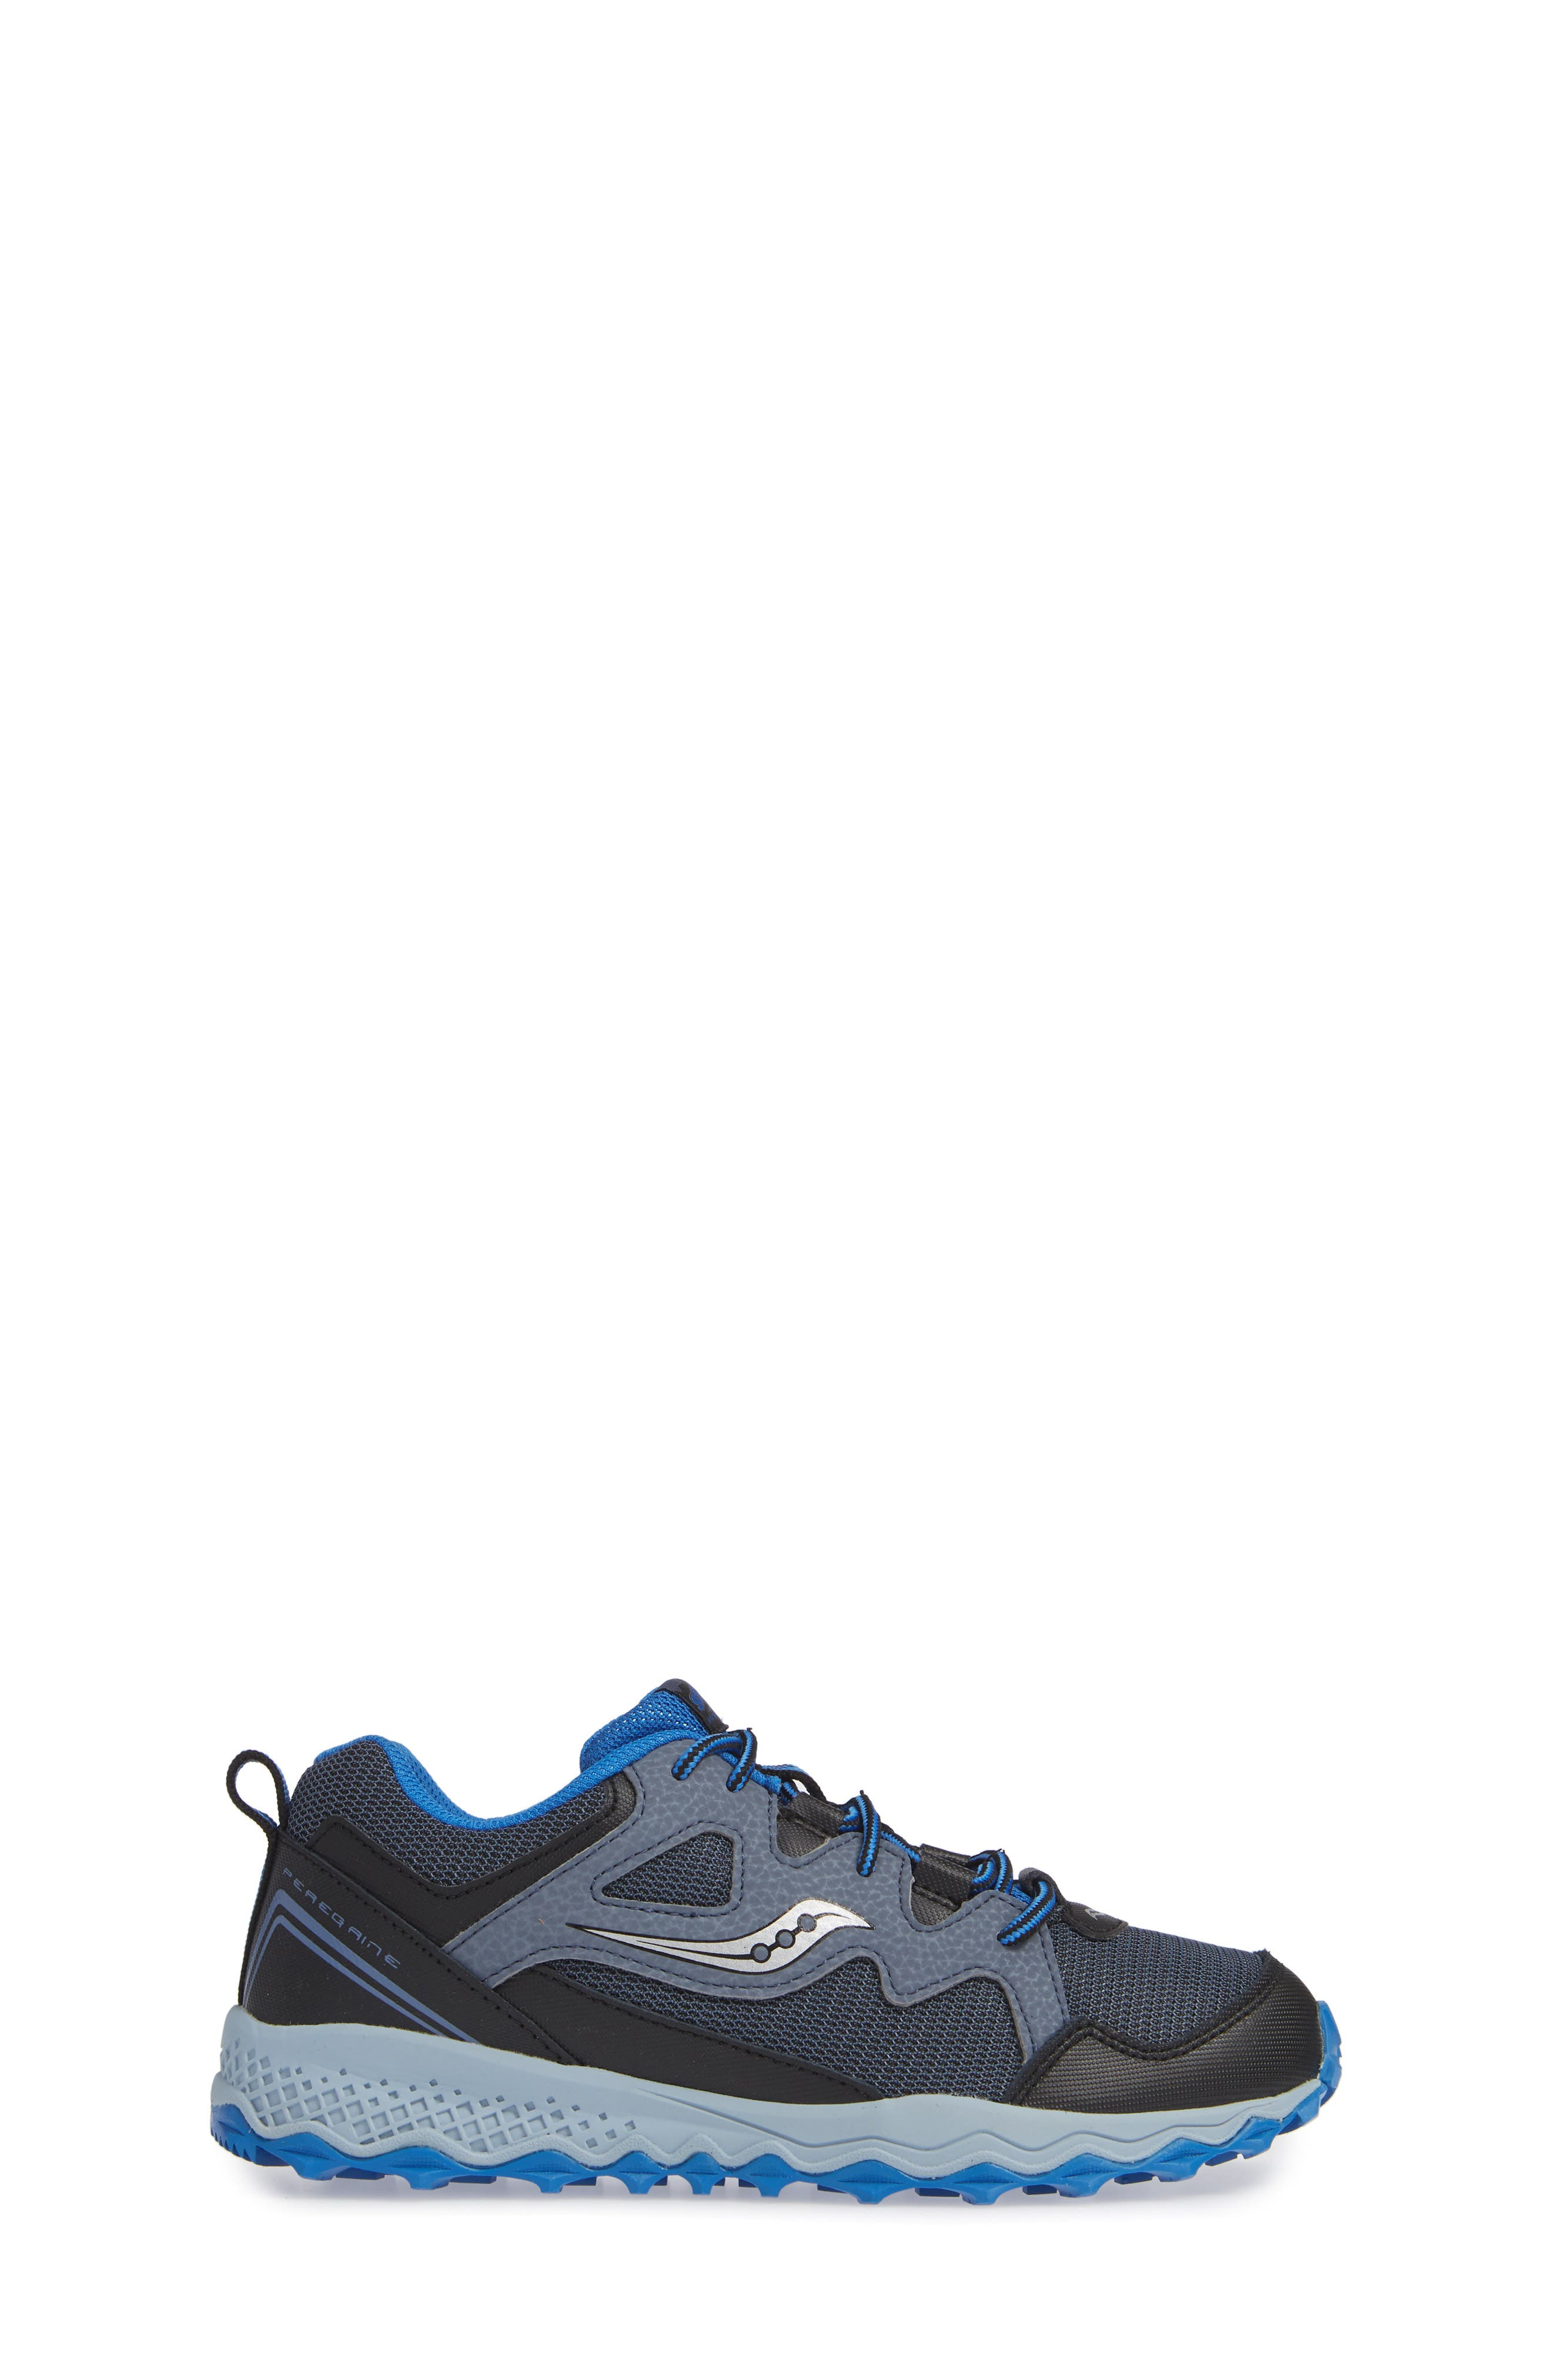 Peregrine Shield 2 Water Repellent Sneaker,                             Alternate thumbnail 3, color,                             020